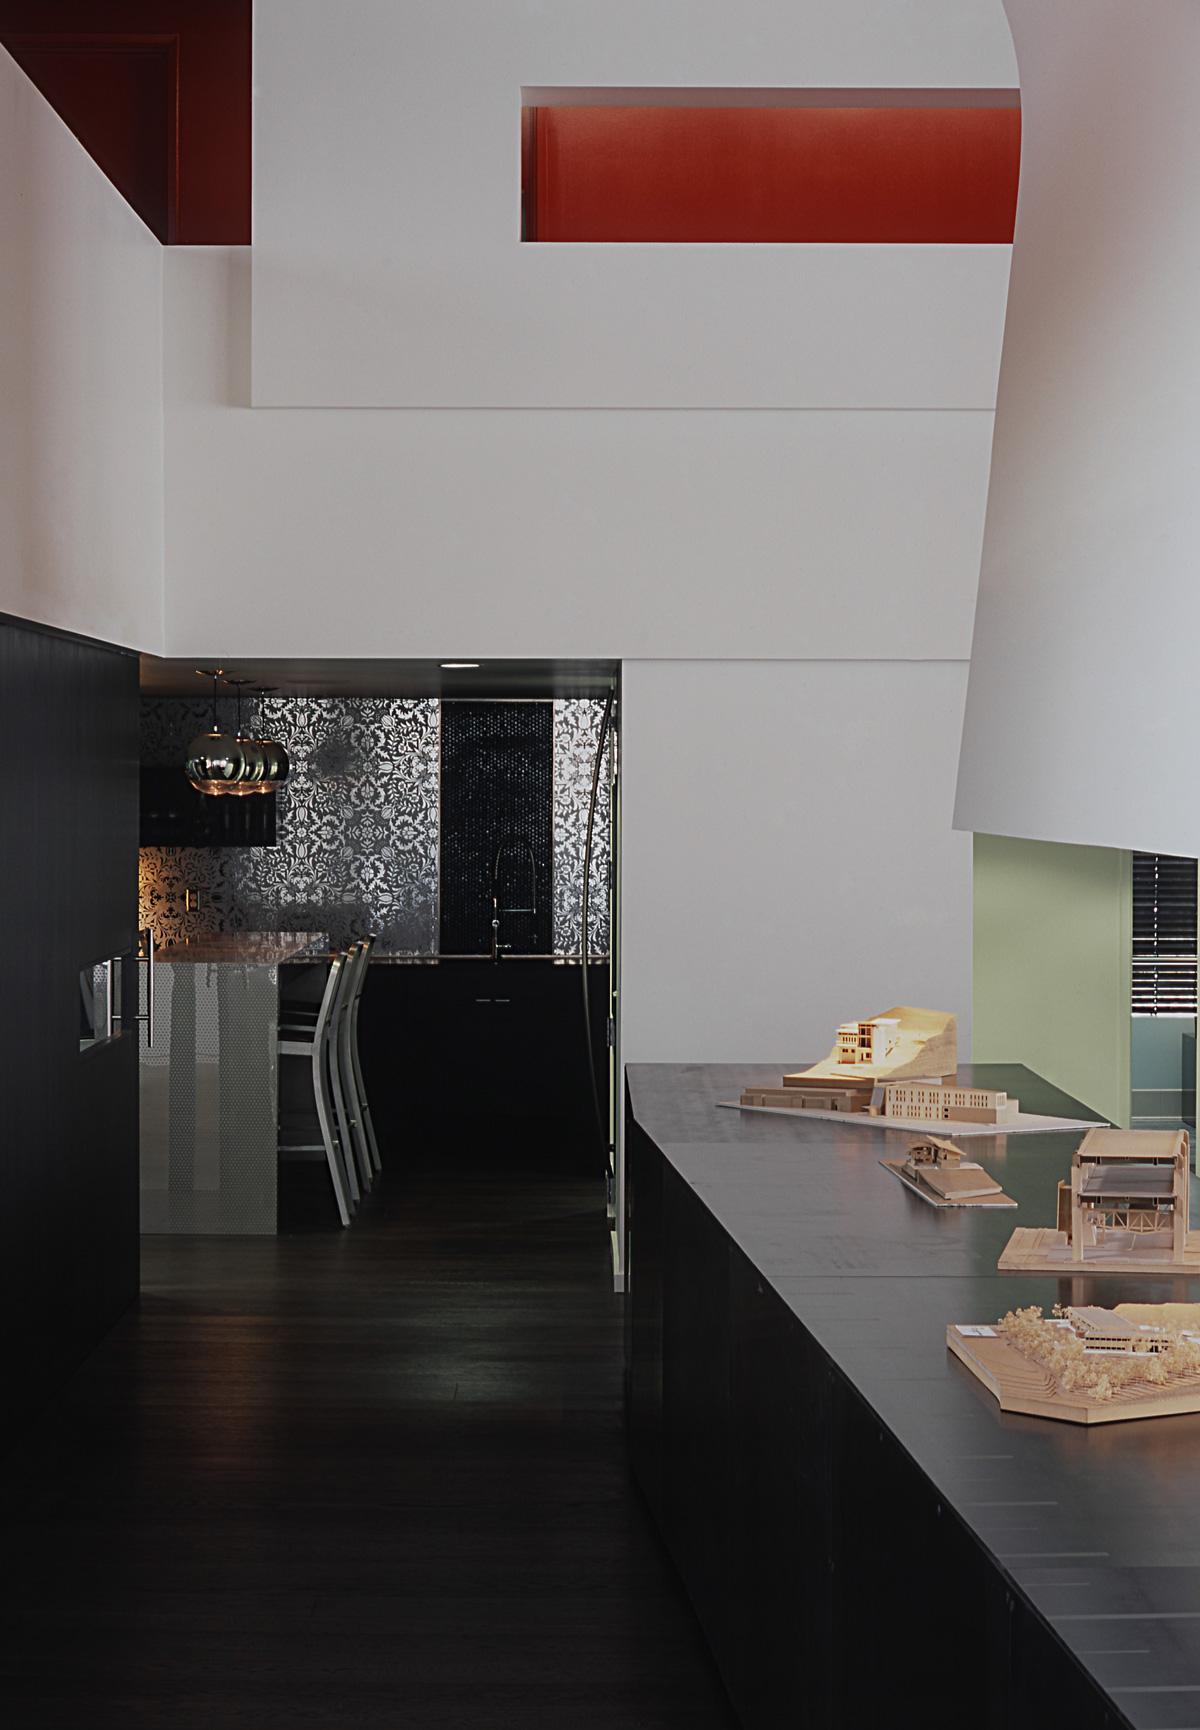 SkB studious kitchen and model countertops